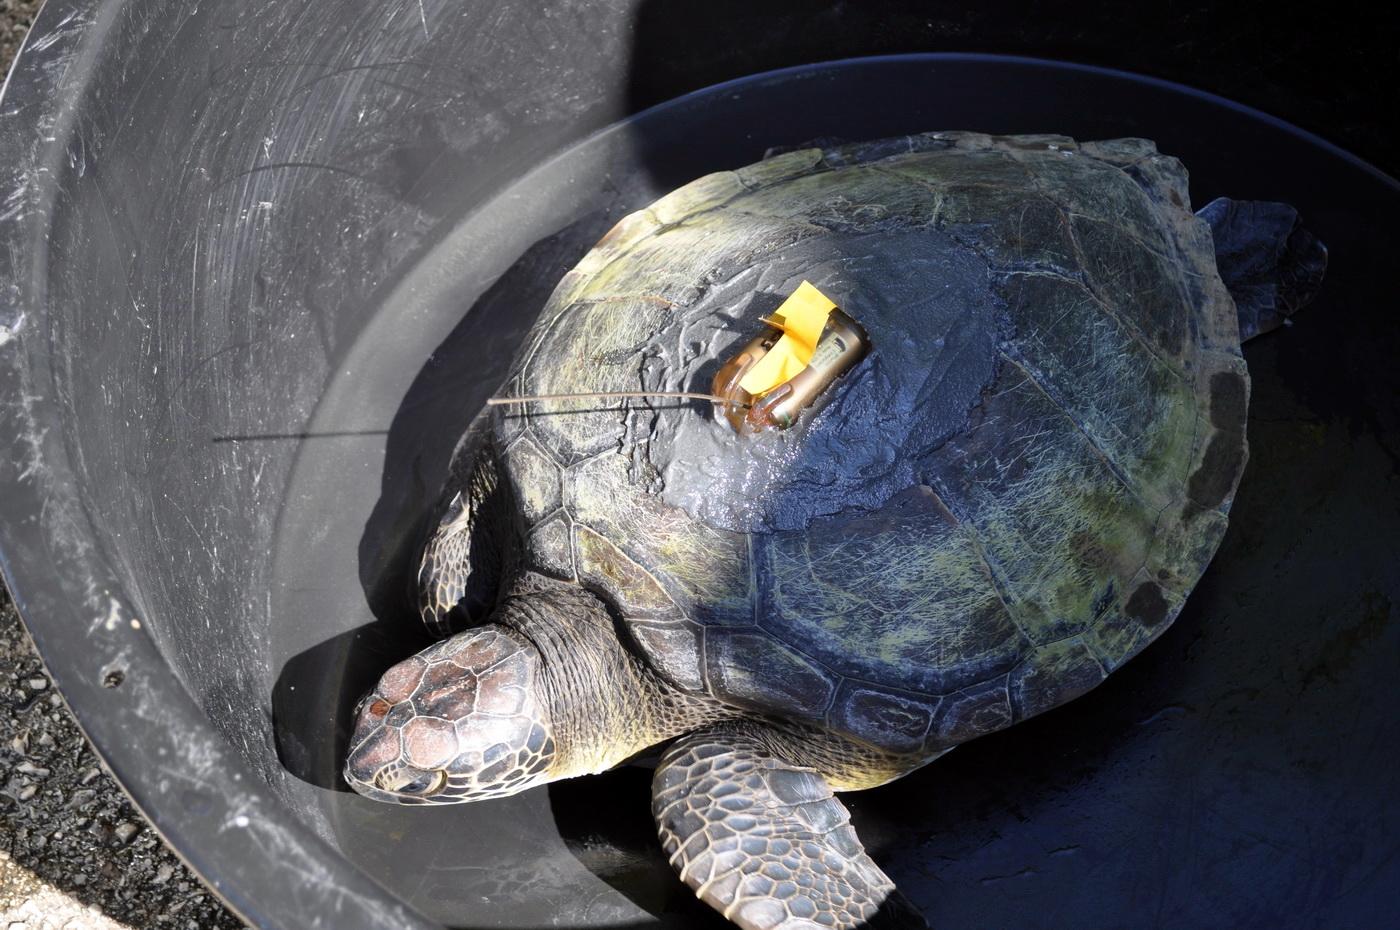 Morsak kornjača